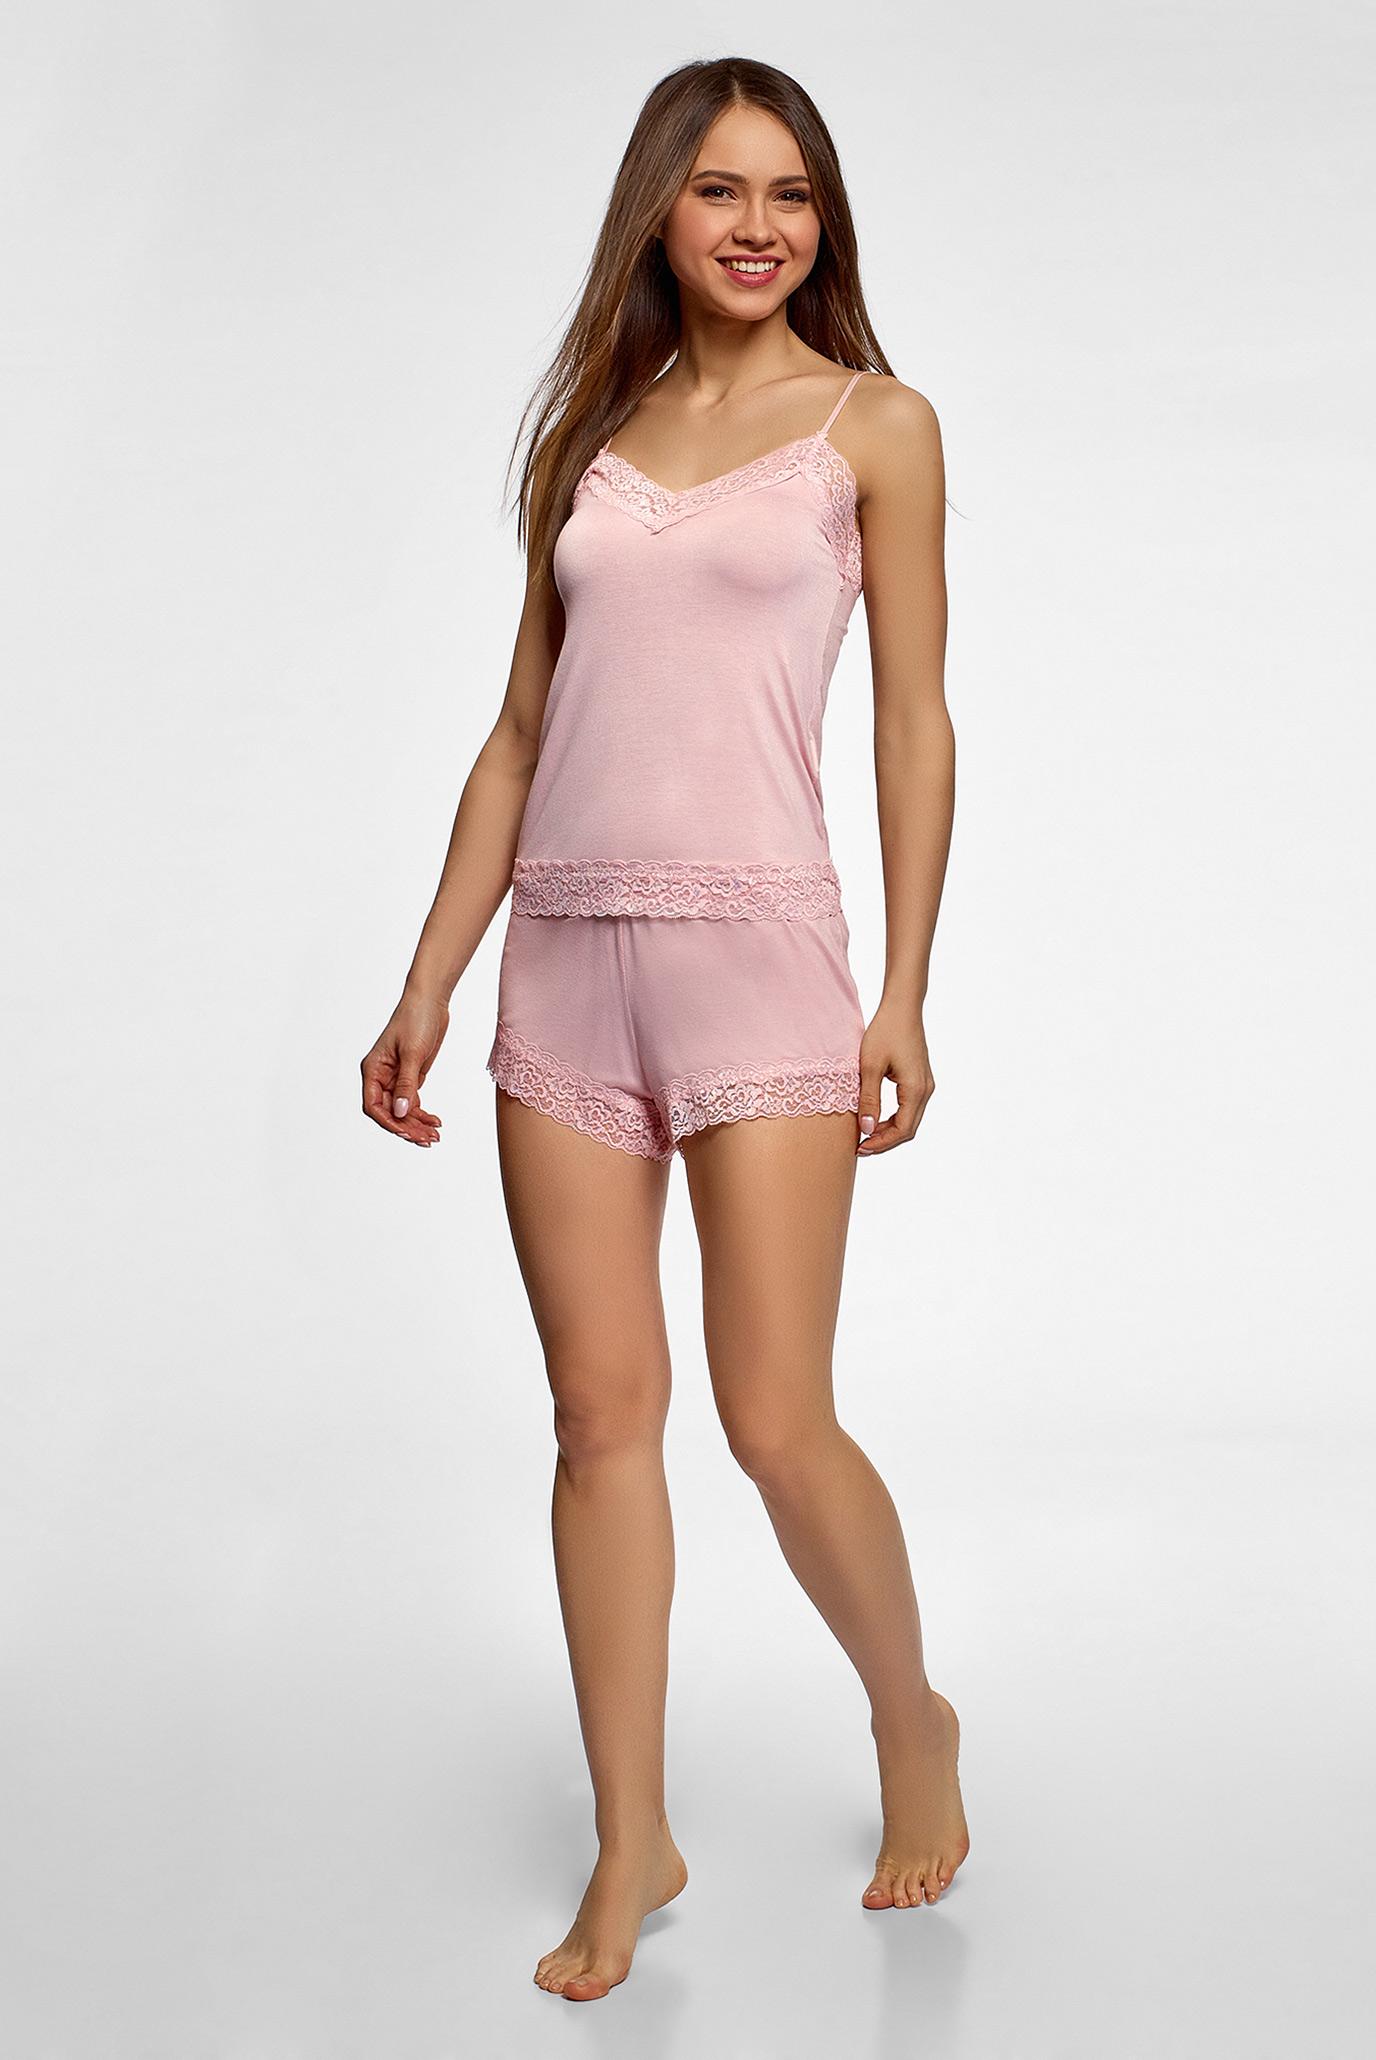 Женская розовая пижама (майка, шорты) Oodji